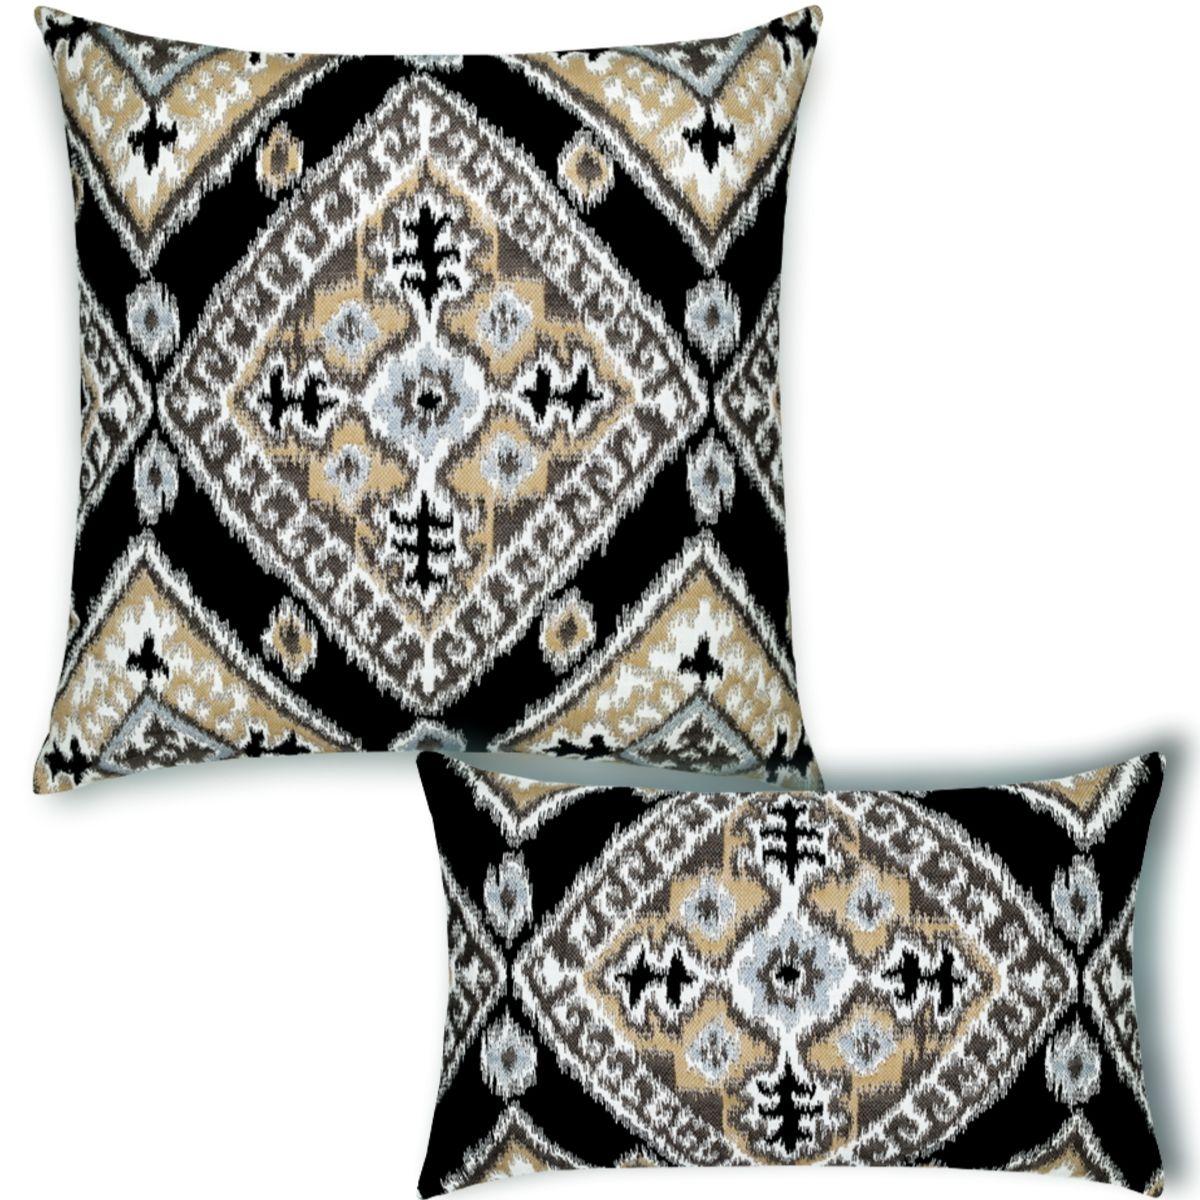 ikat-diamond-onyx pillow set